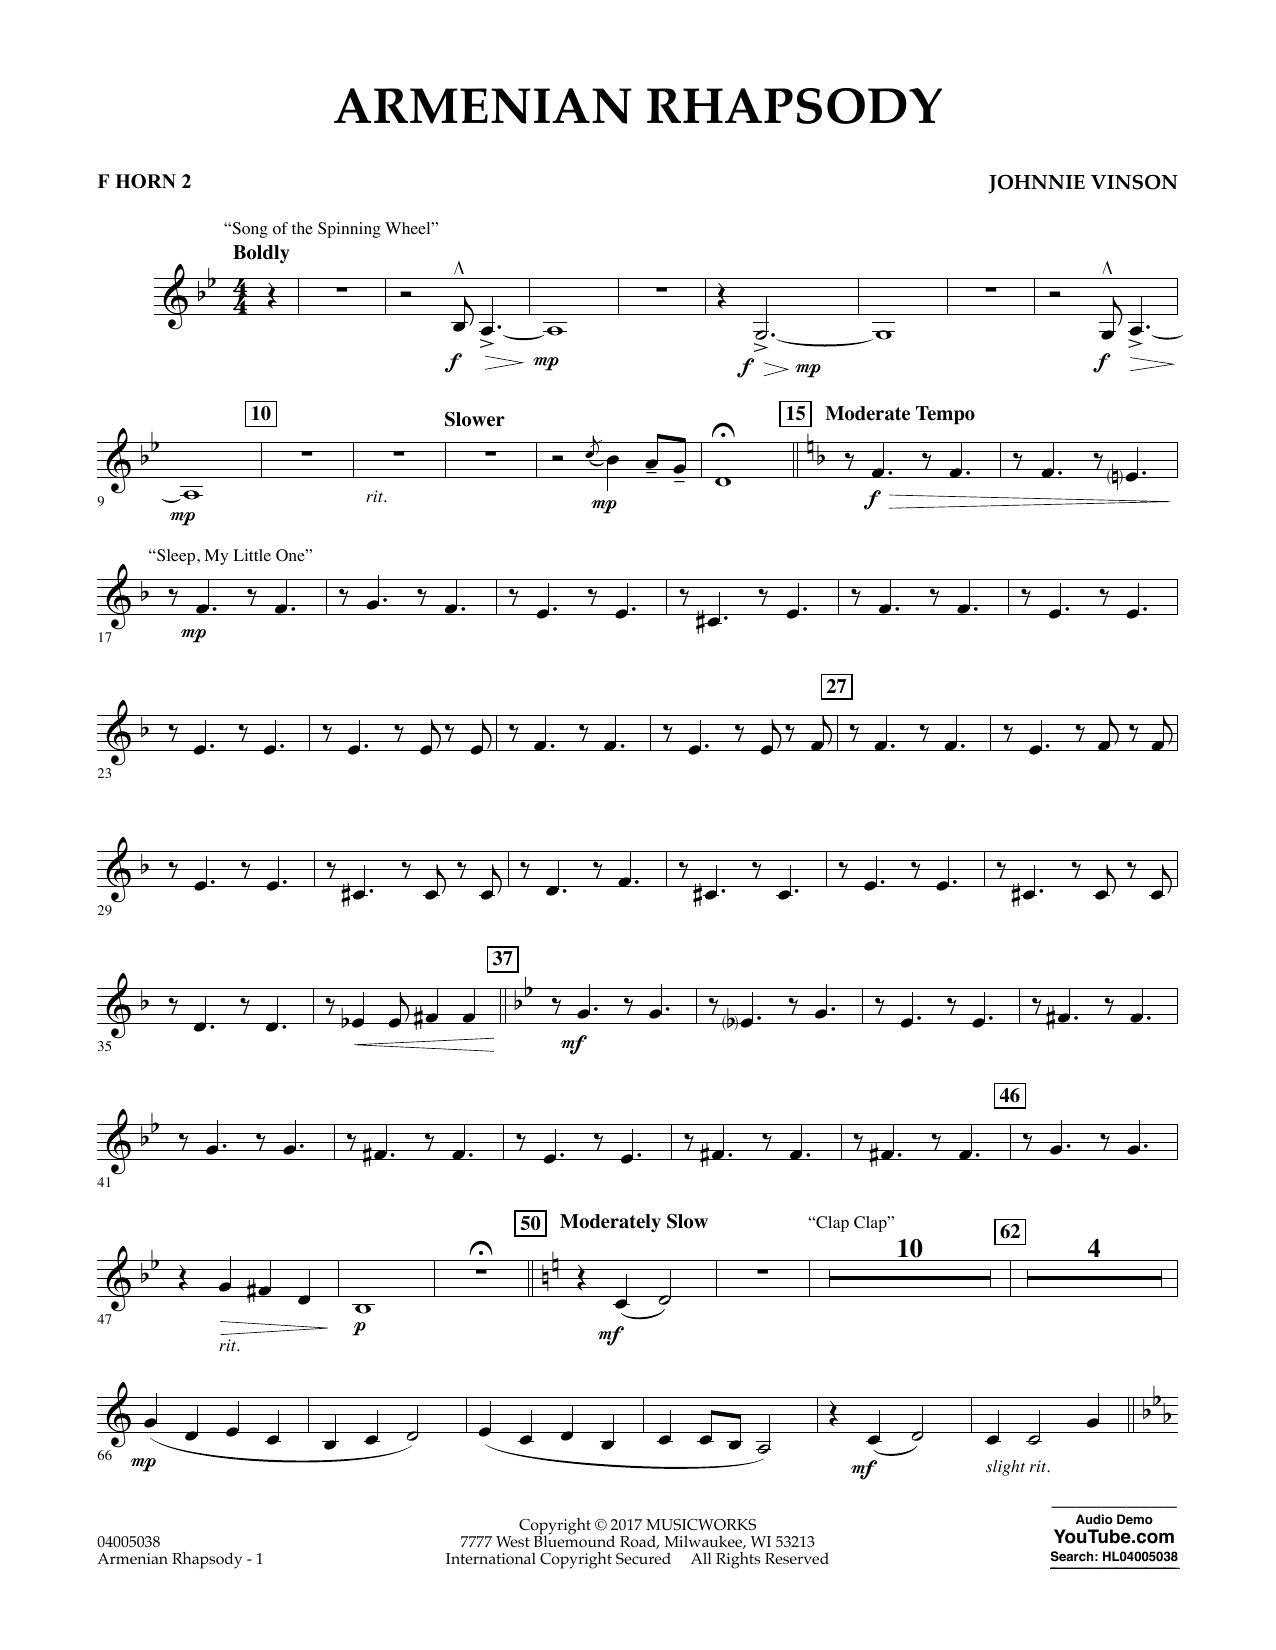 Armenian Rhapsody - F Horn 2 Sheet Music